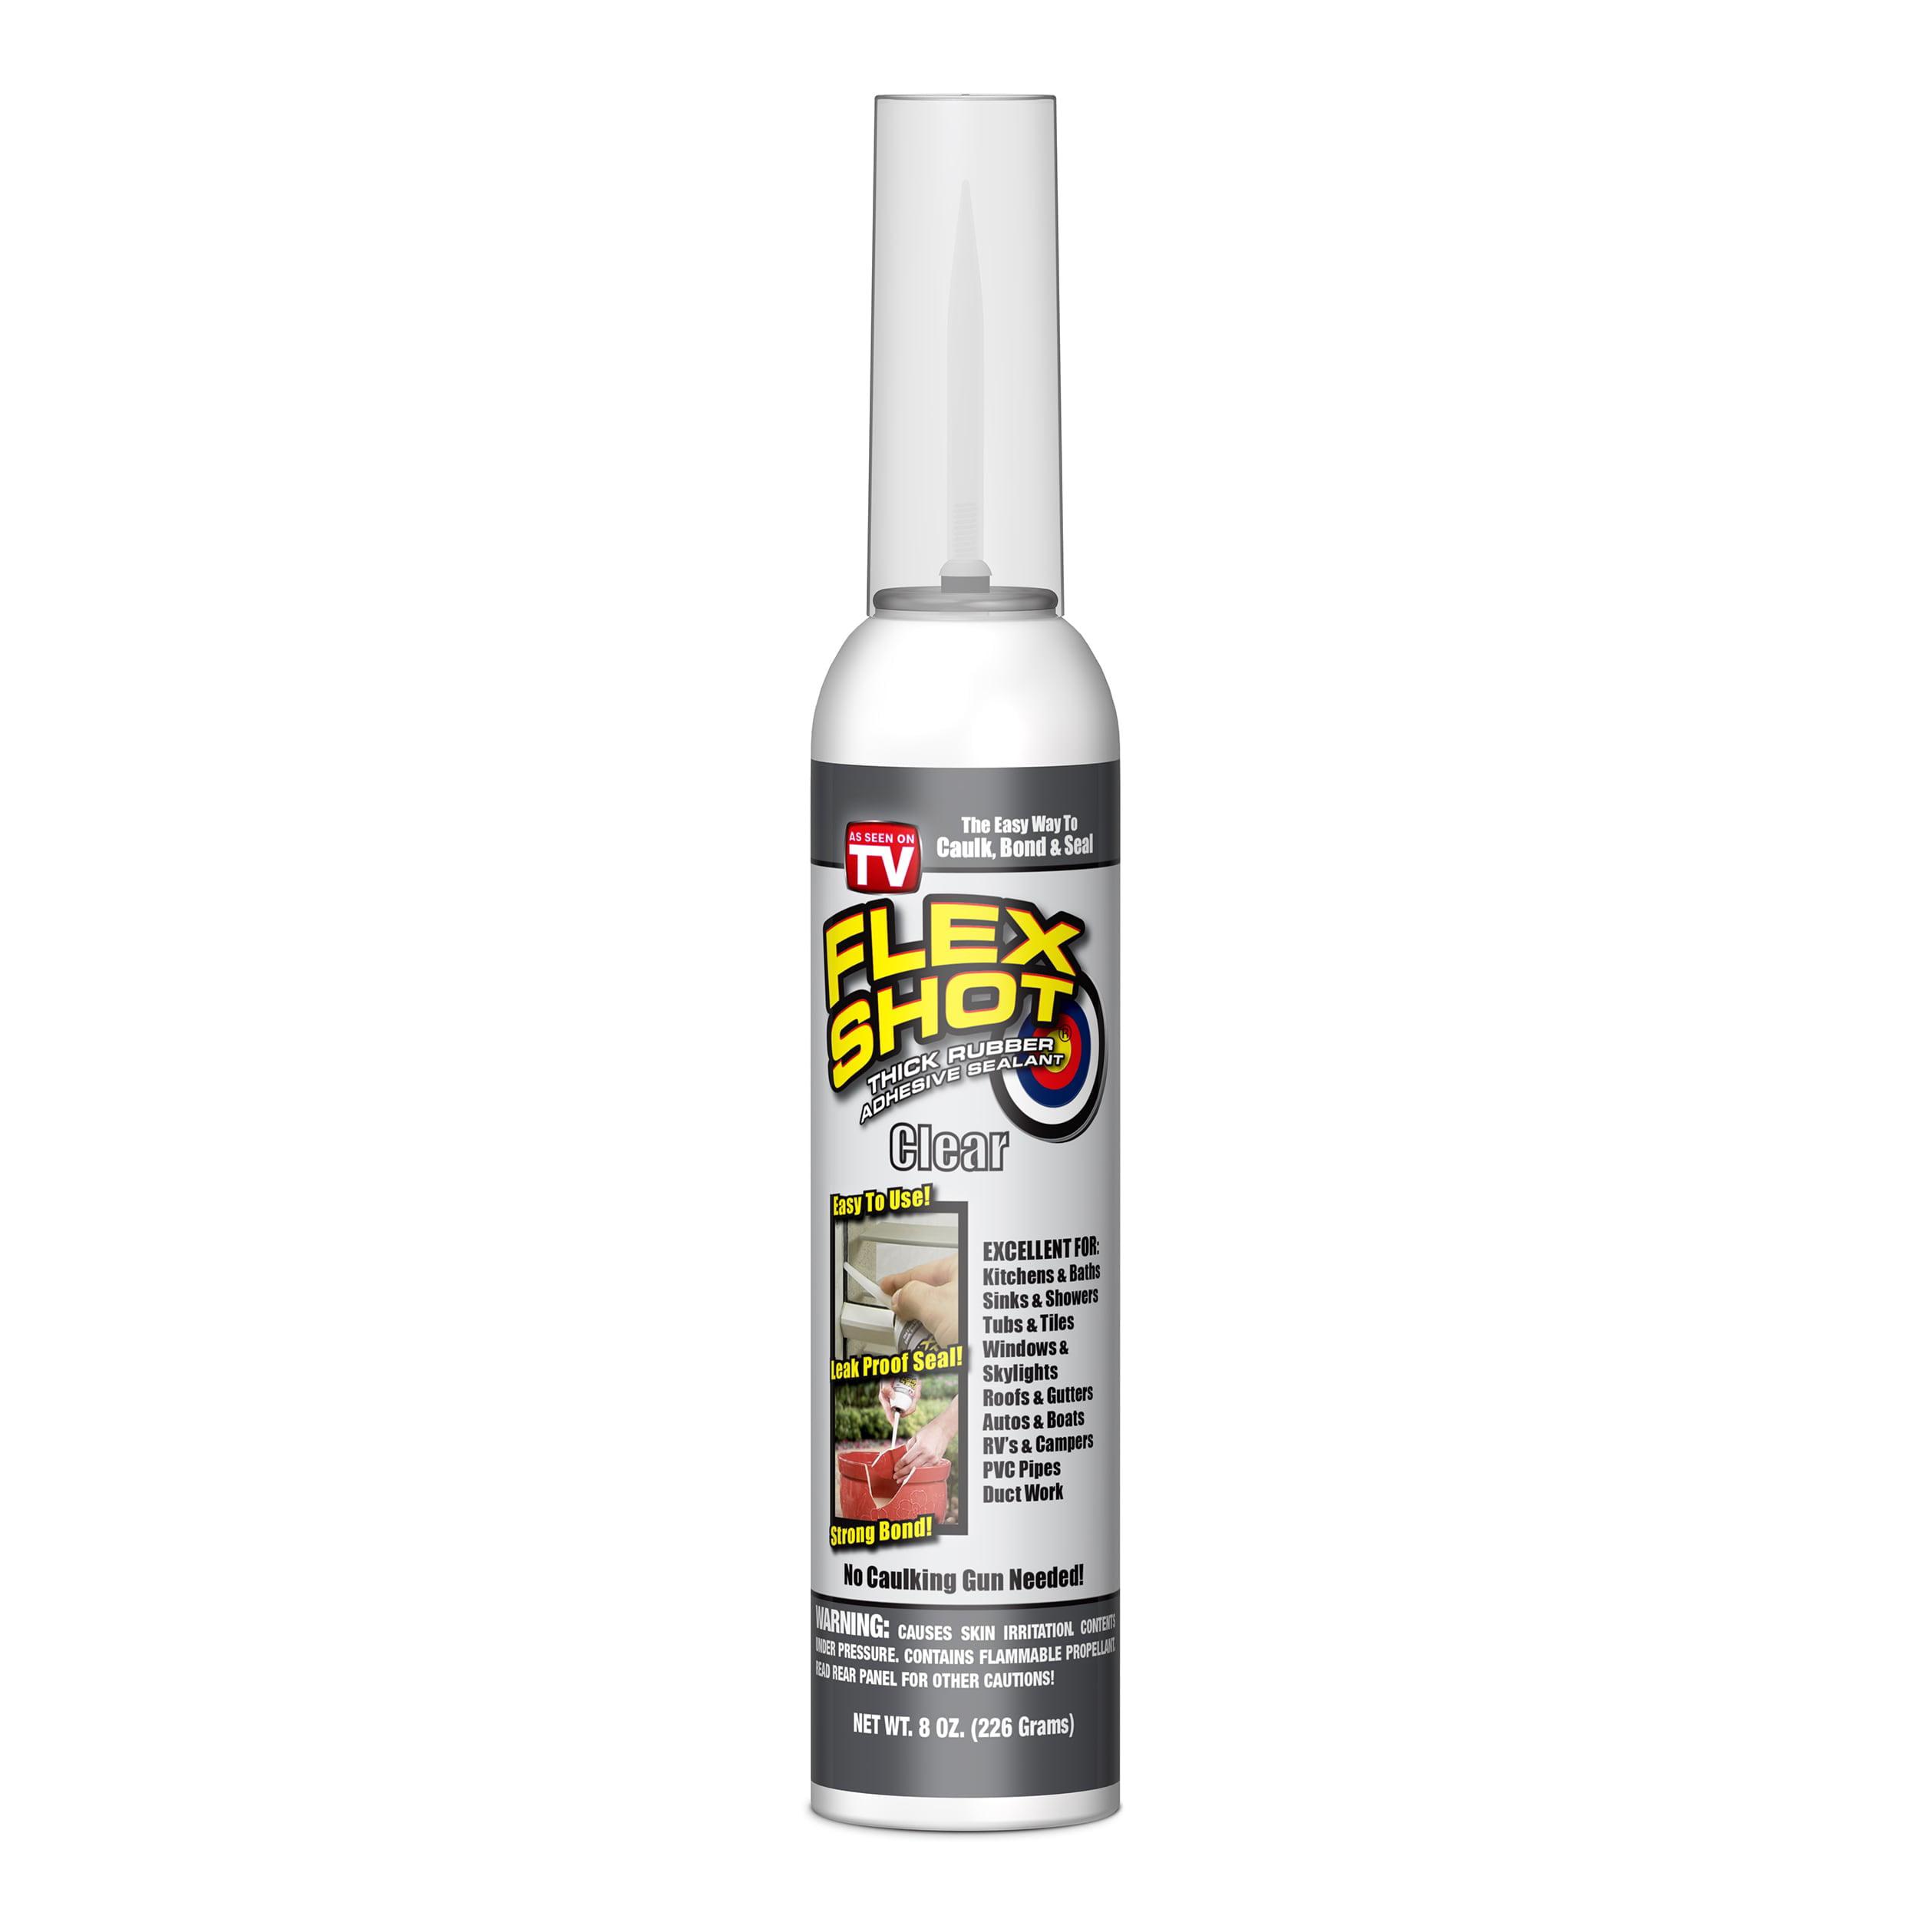 Flex Shot Rubber Adhesive Sealant Caulk, 8-oz, Clear – BrickSeek